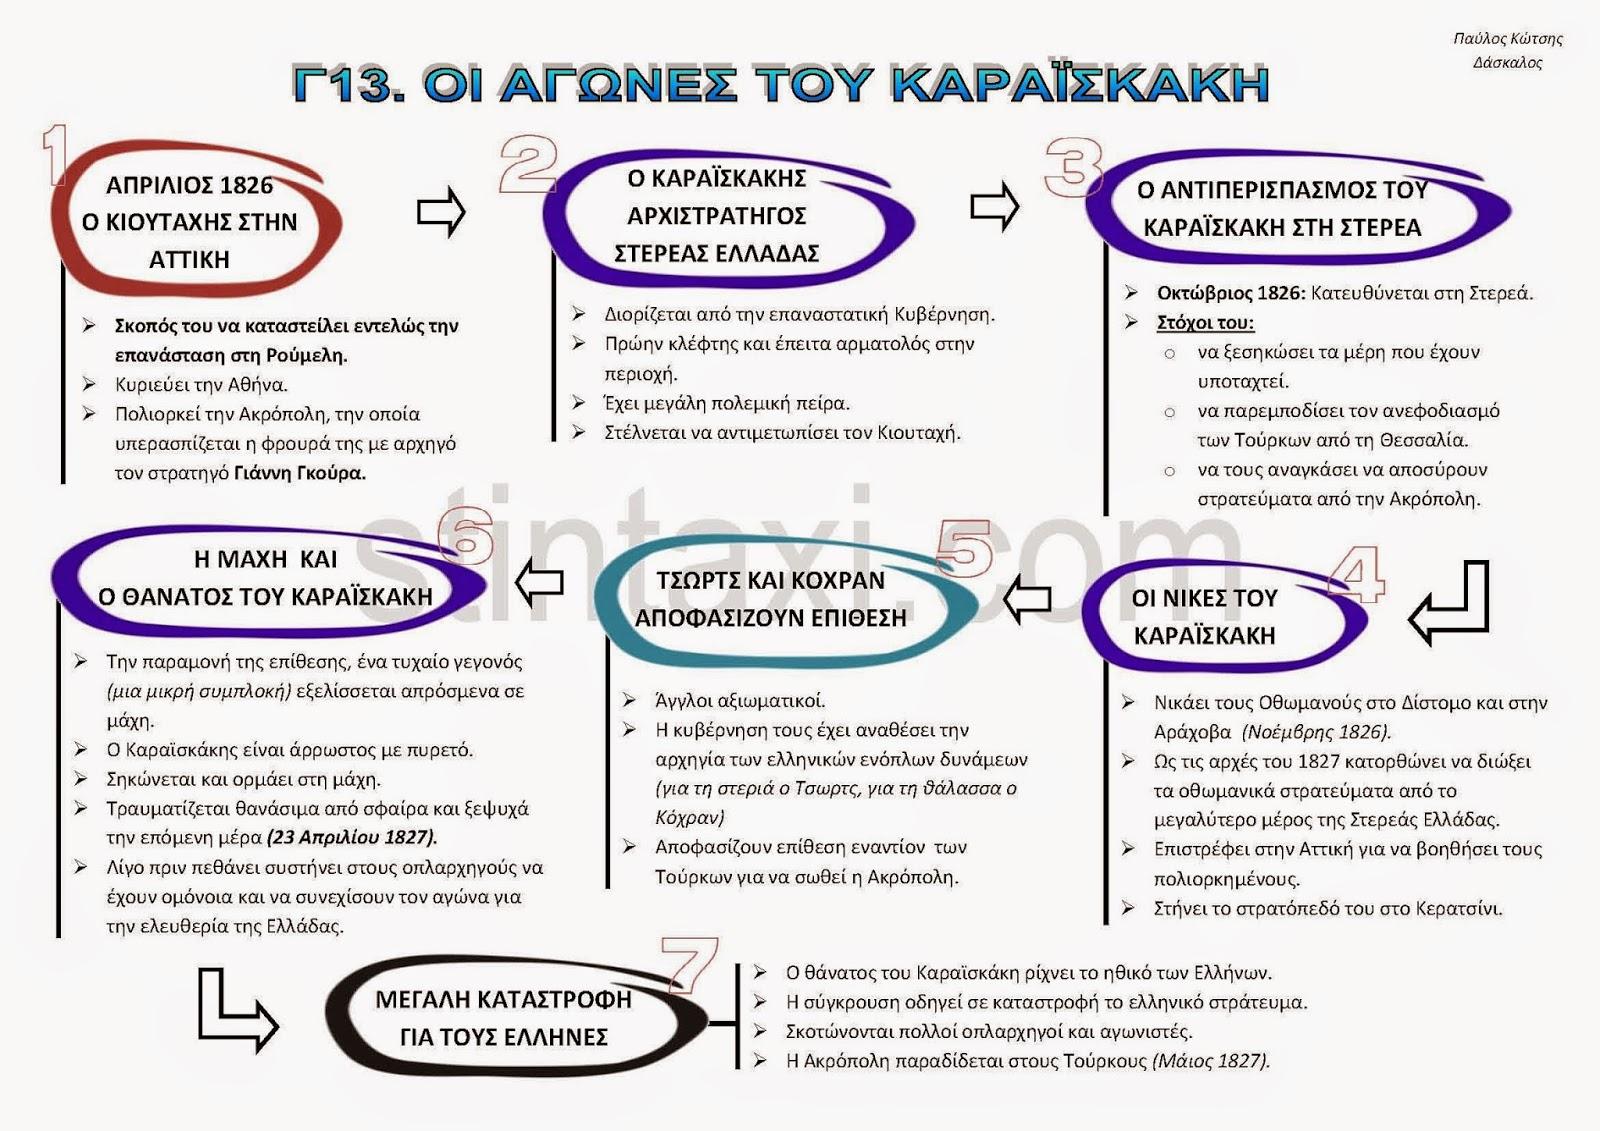 http://www.stintaxi.com/uploads/1/3/1/0/13100858/c13-karaiskakis-v2.1.pdf